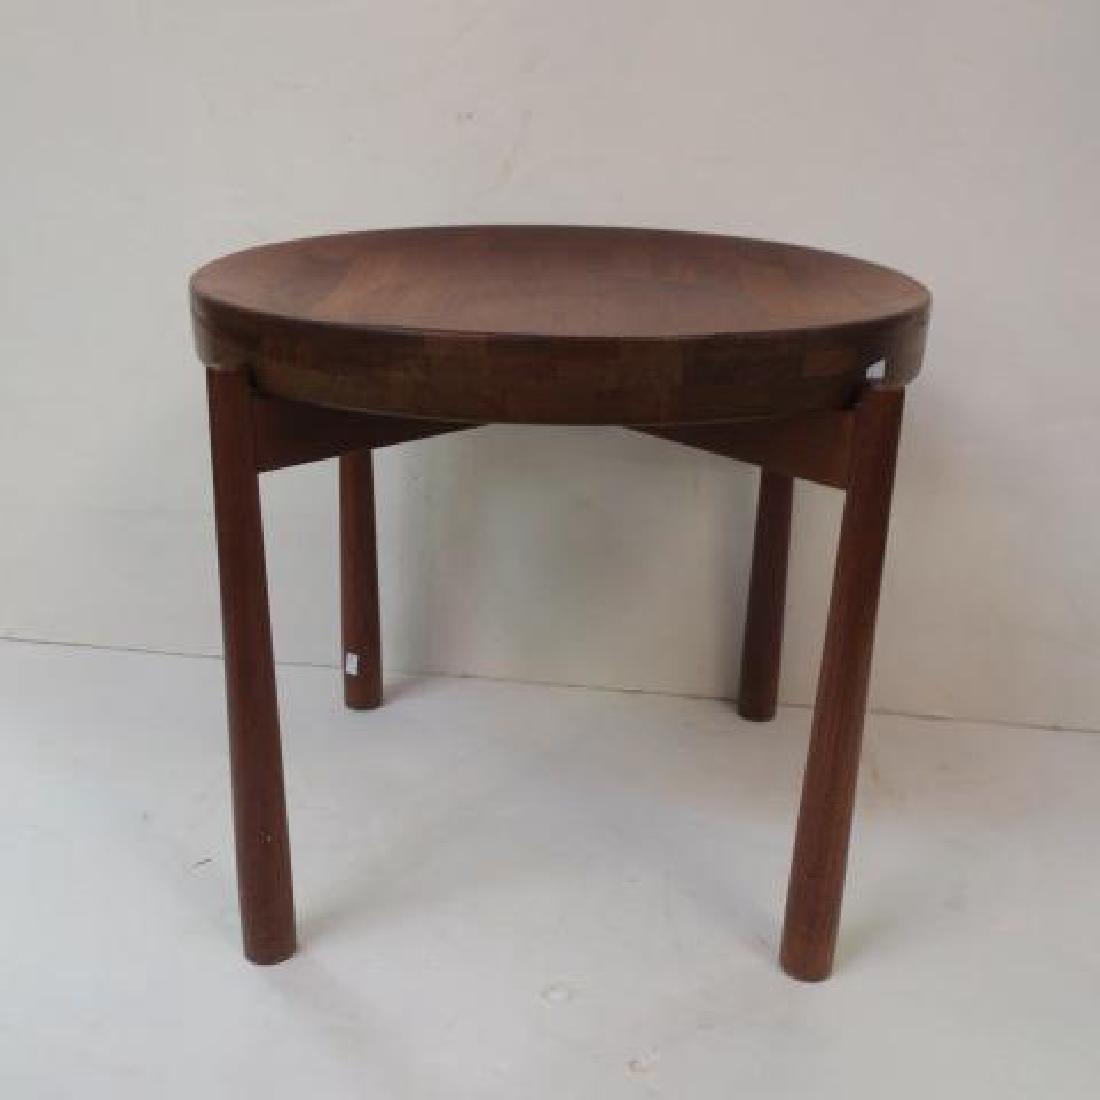 Round Danish Modern Teak Side Table: - 4